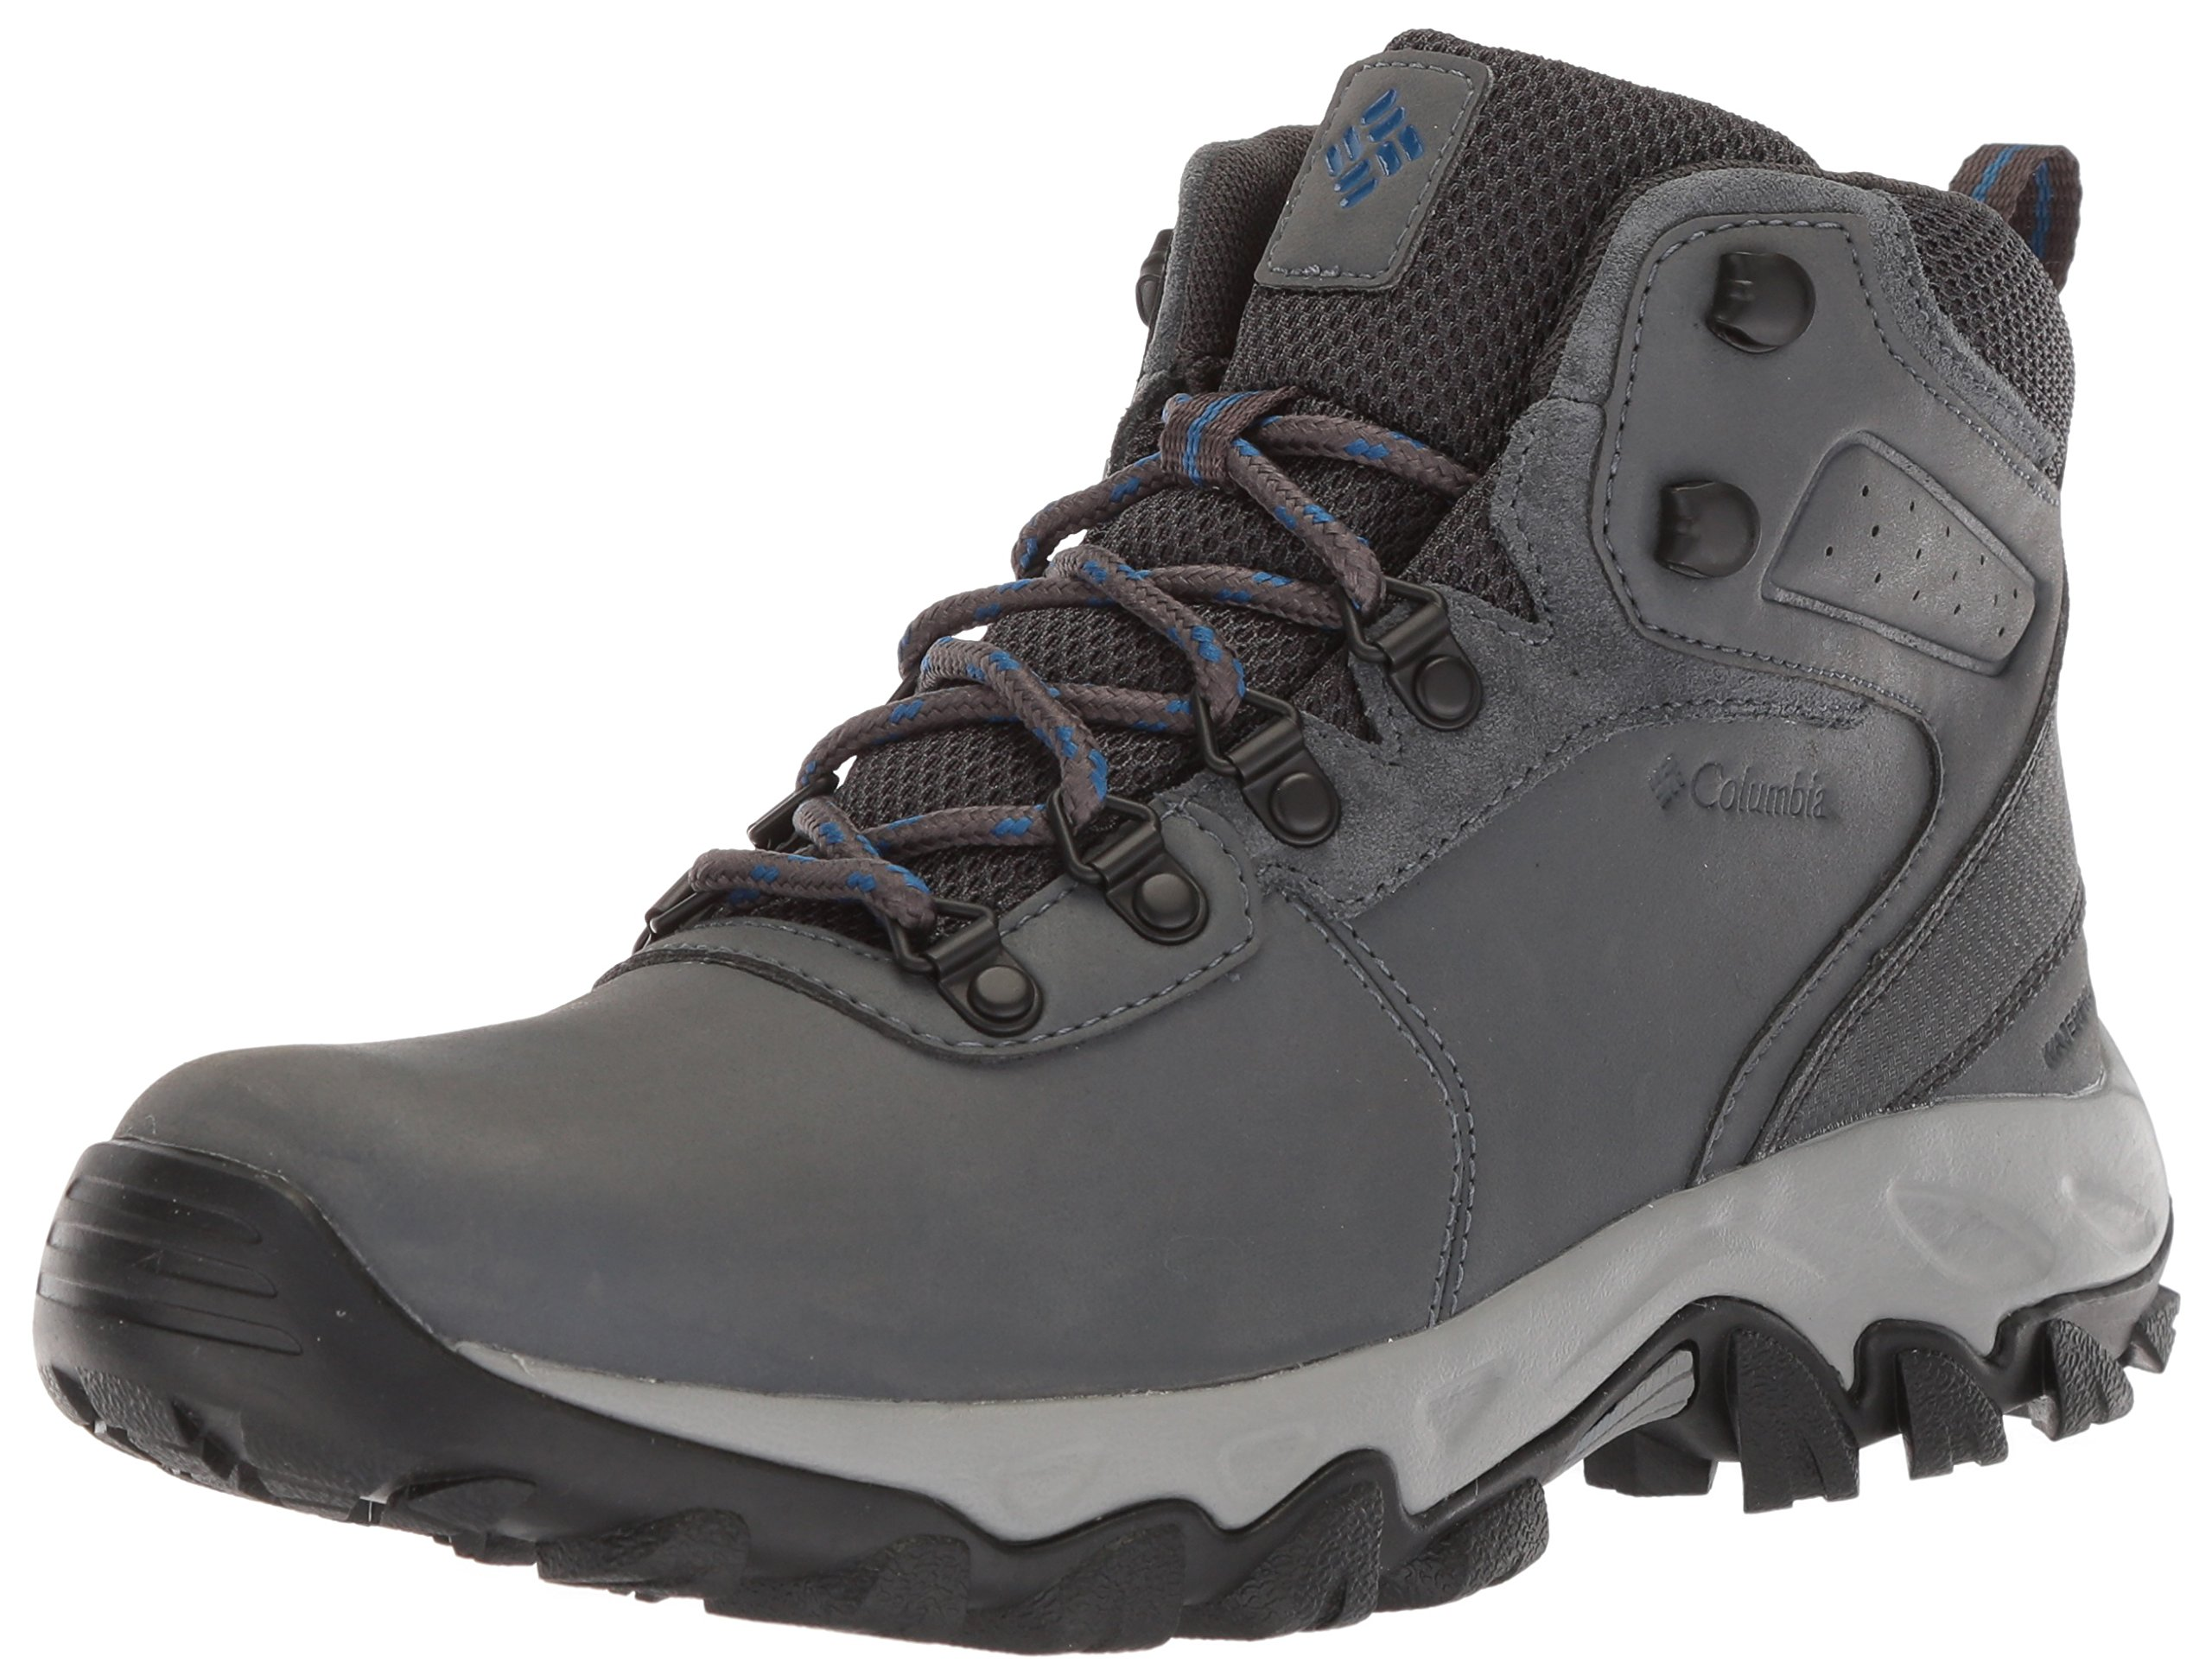 faa916d3b43 Columbia Mens Newton Ridge Plus II Waterproof Hiking Boot - BSA Soar